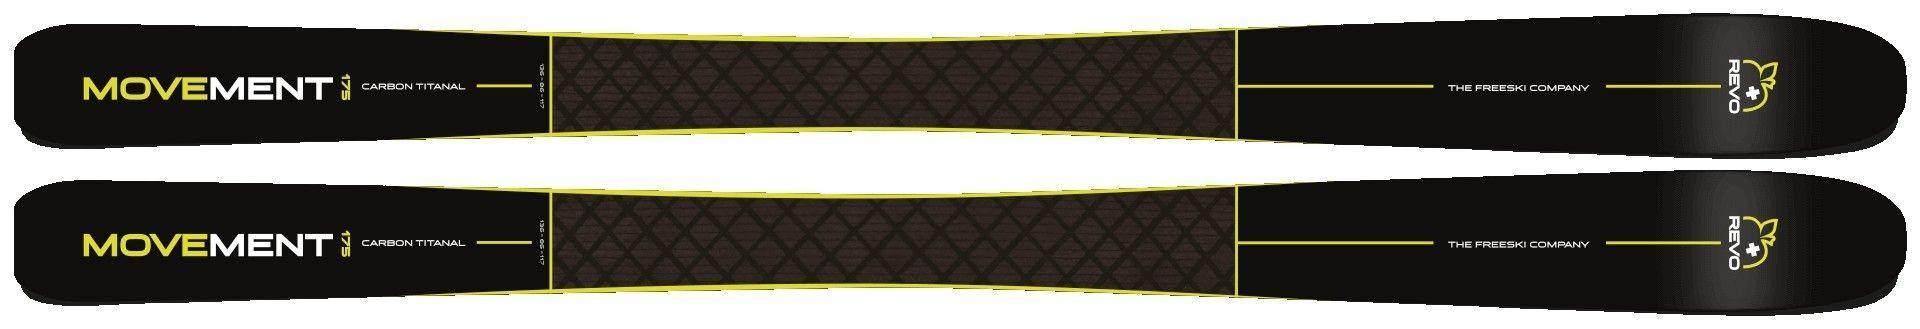 REVO TITANAL 86